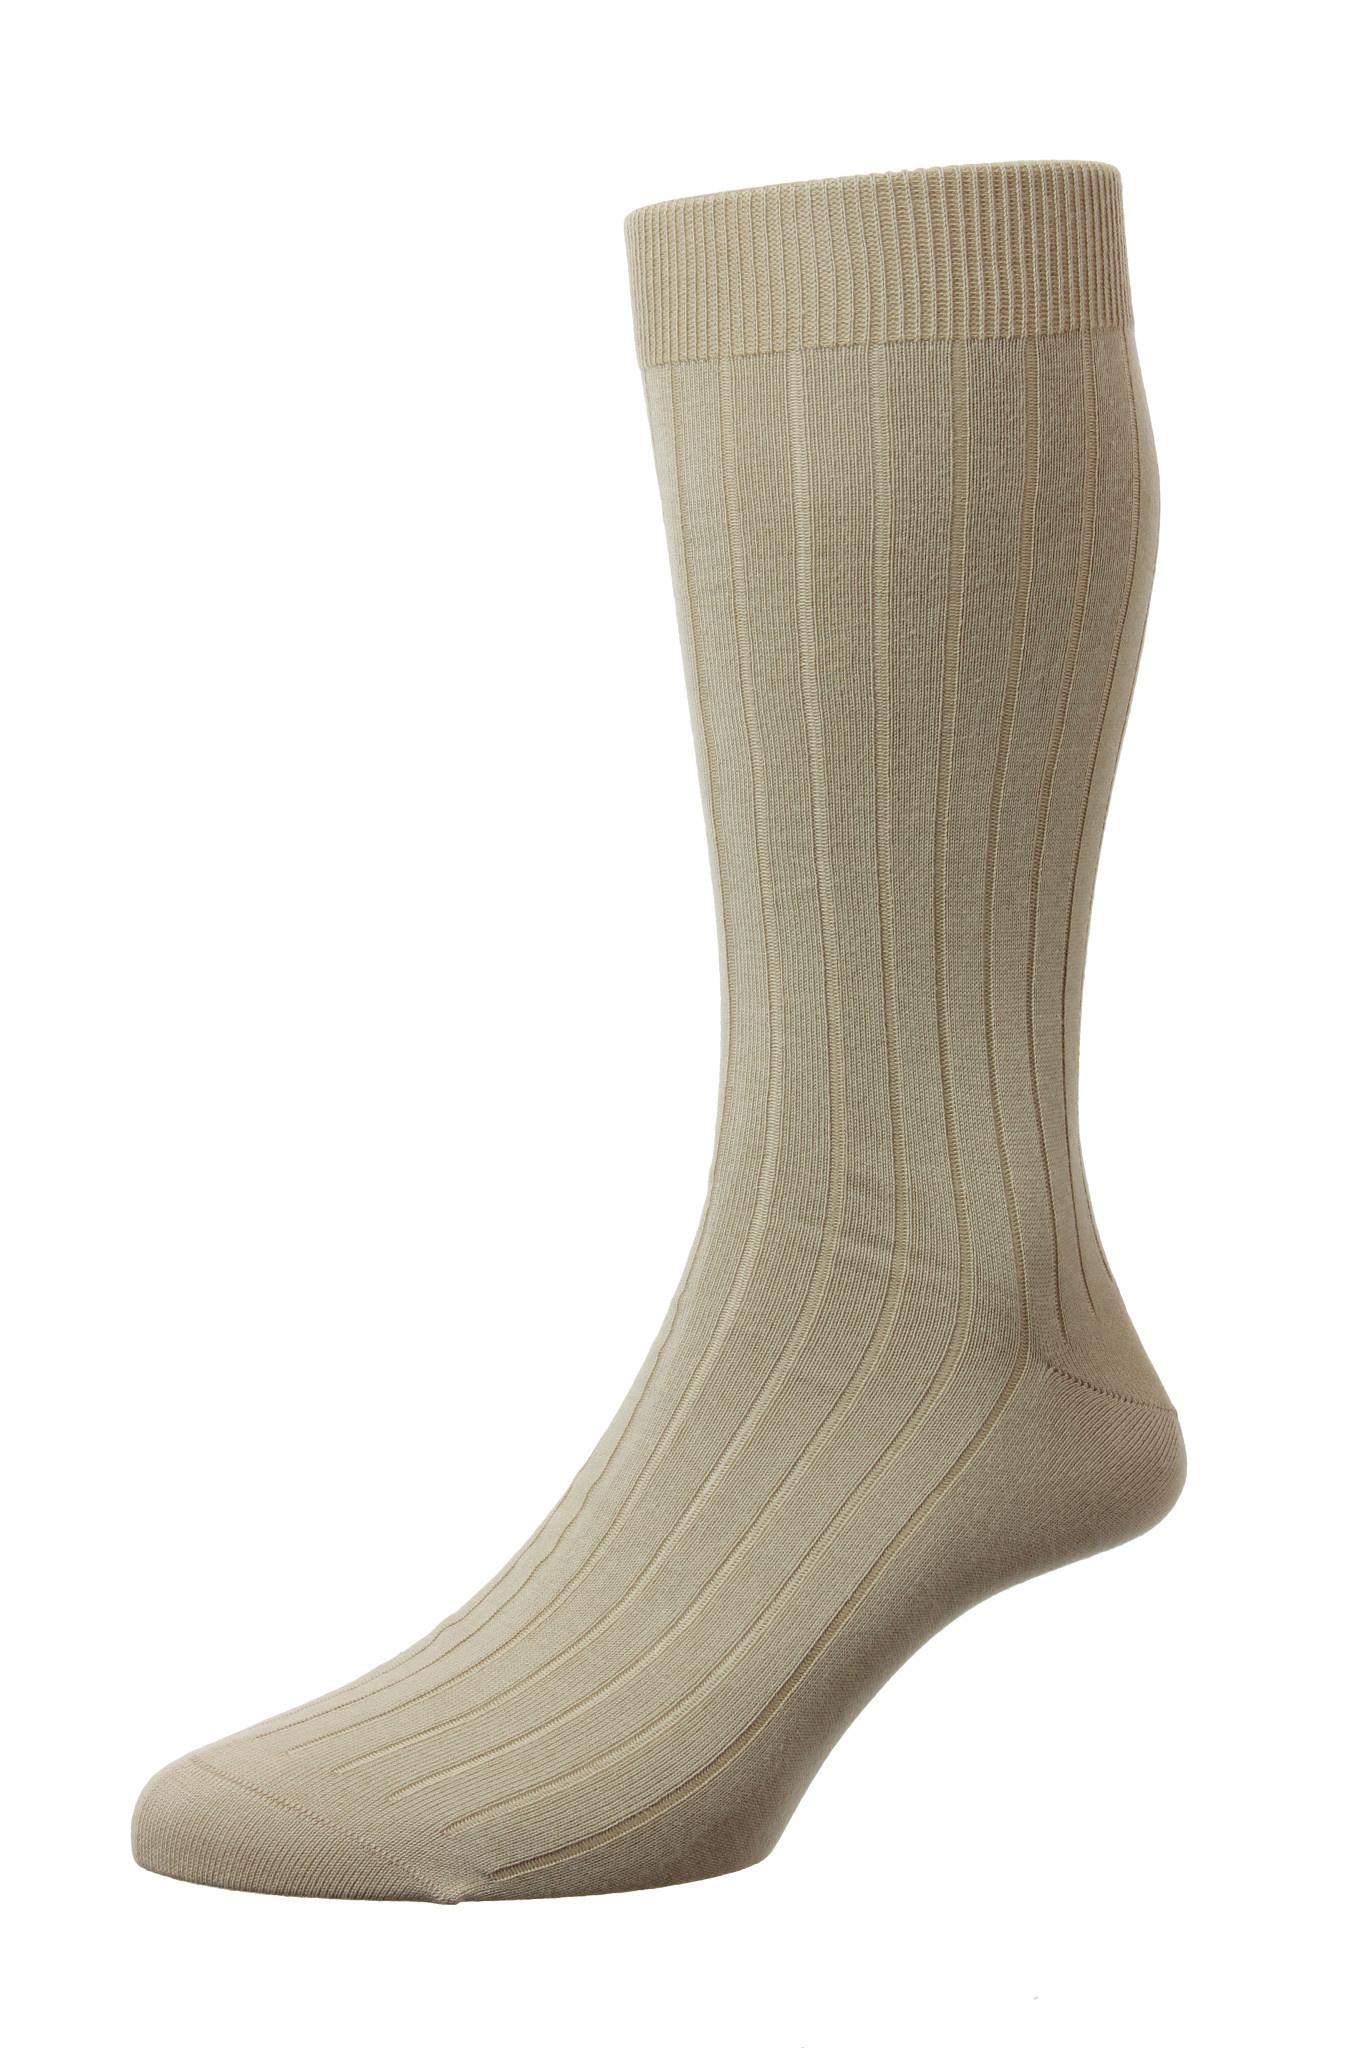 Pantherella Sea Island Cotton Socks - Pembrey